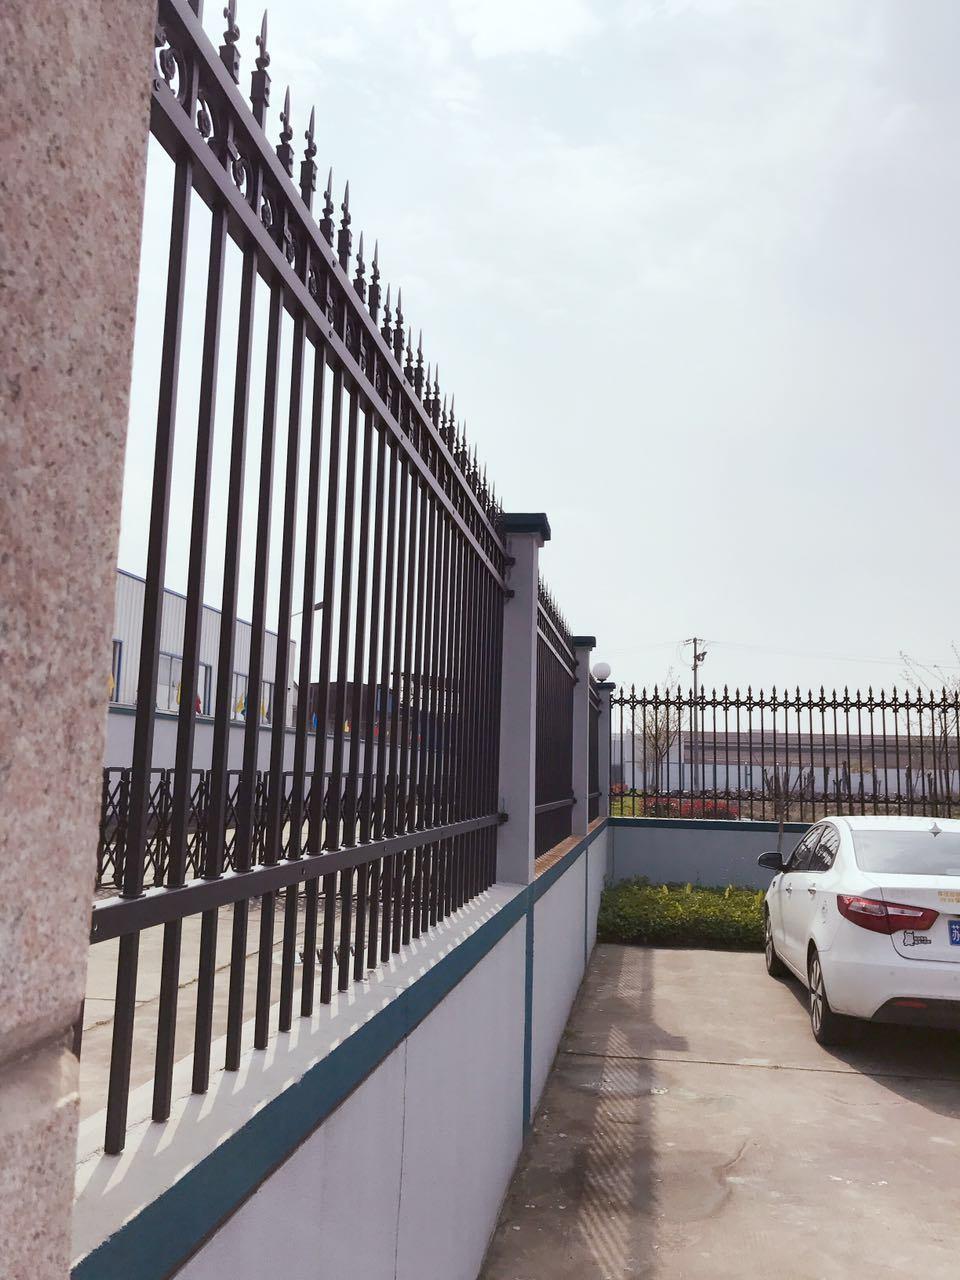 Metal Privacy Galvanized Black Powder Coated Garden Fence